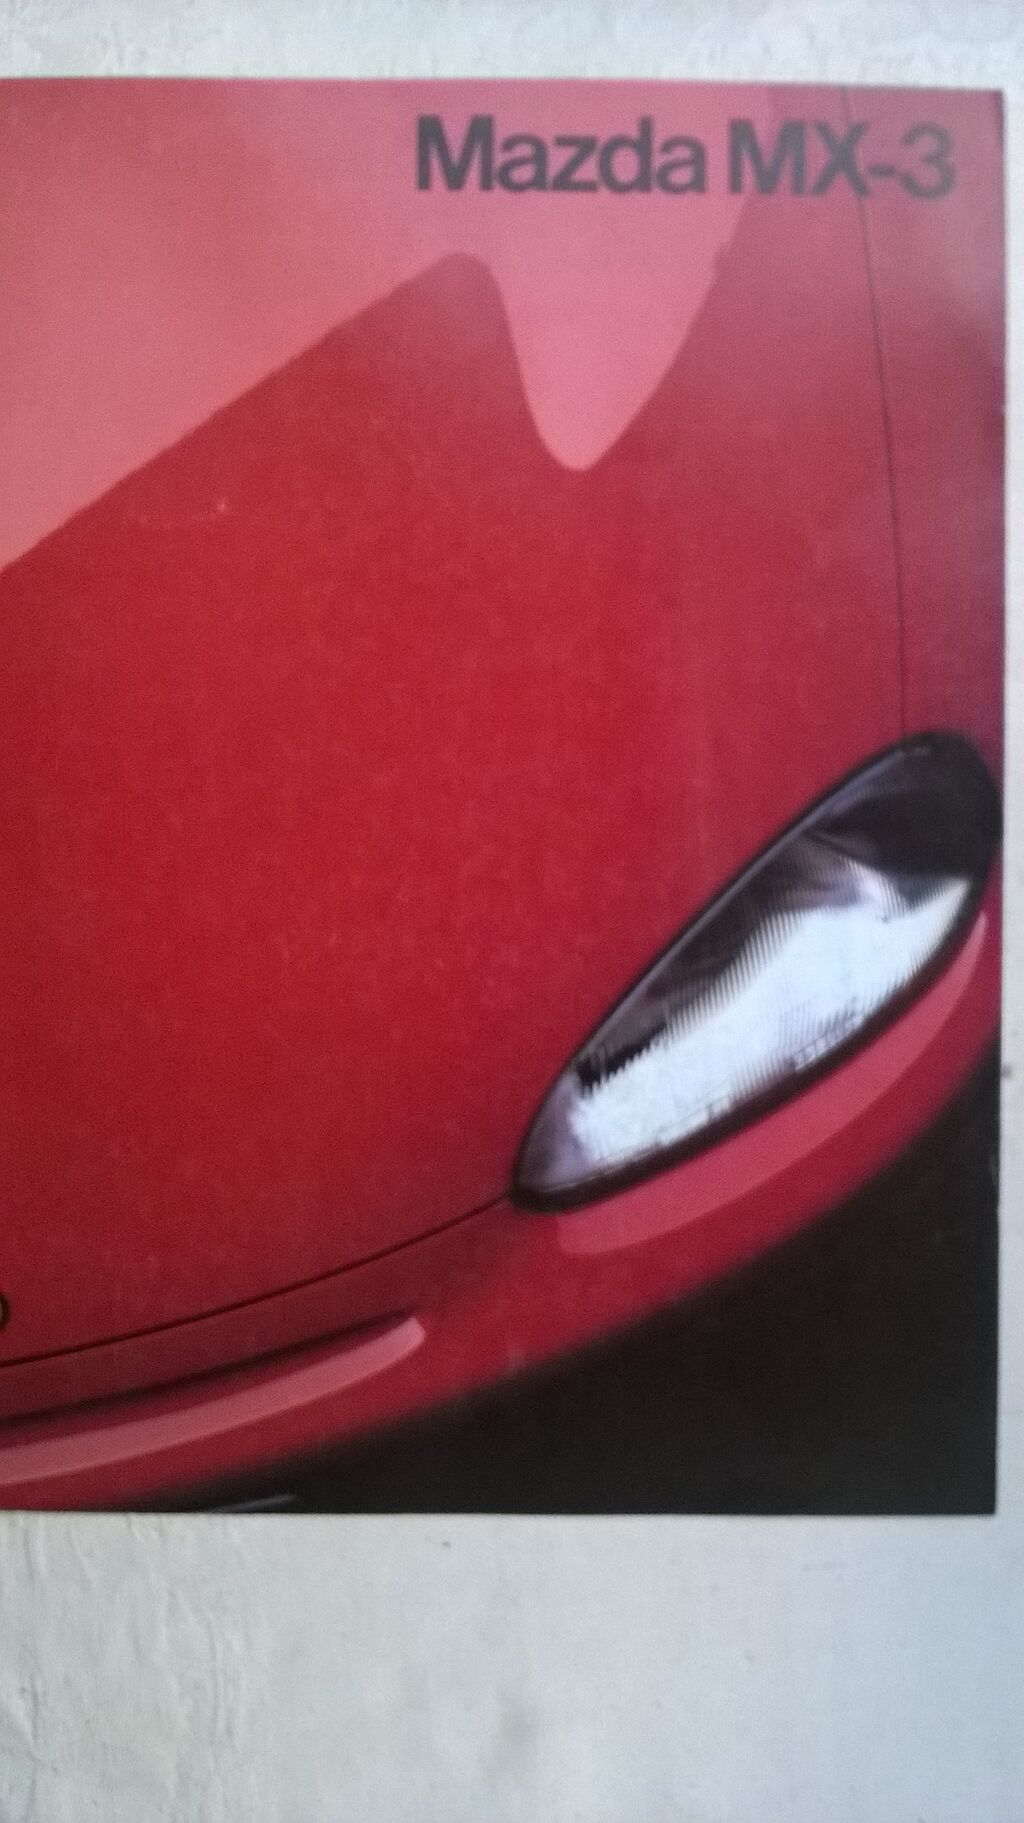 Prospekt Mazda MX-3 20 str.,A4 format,nem